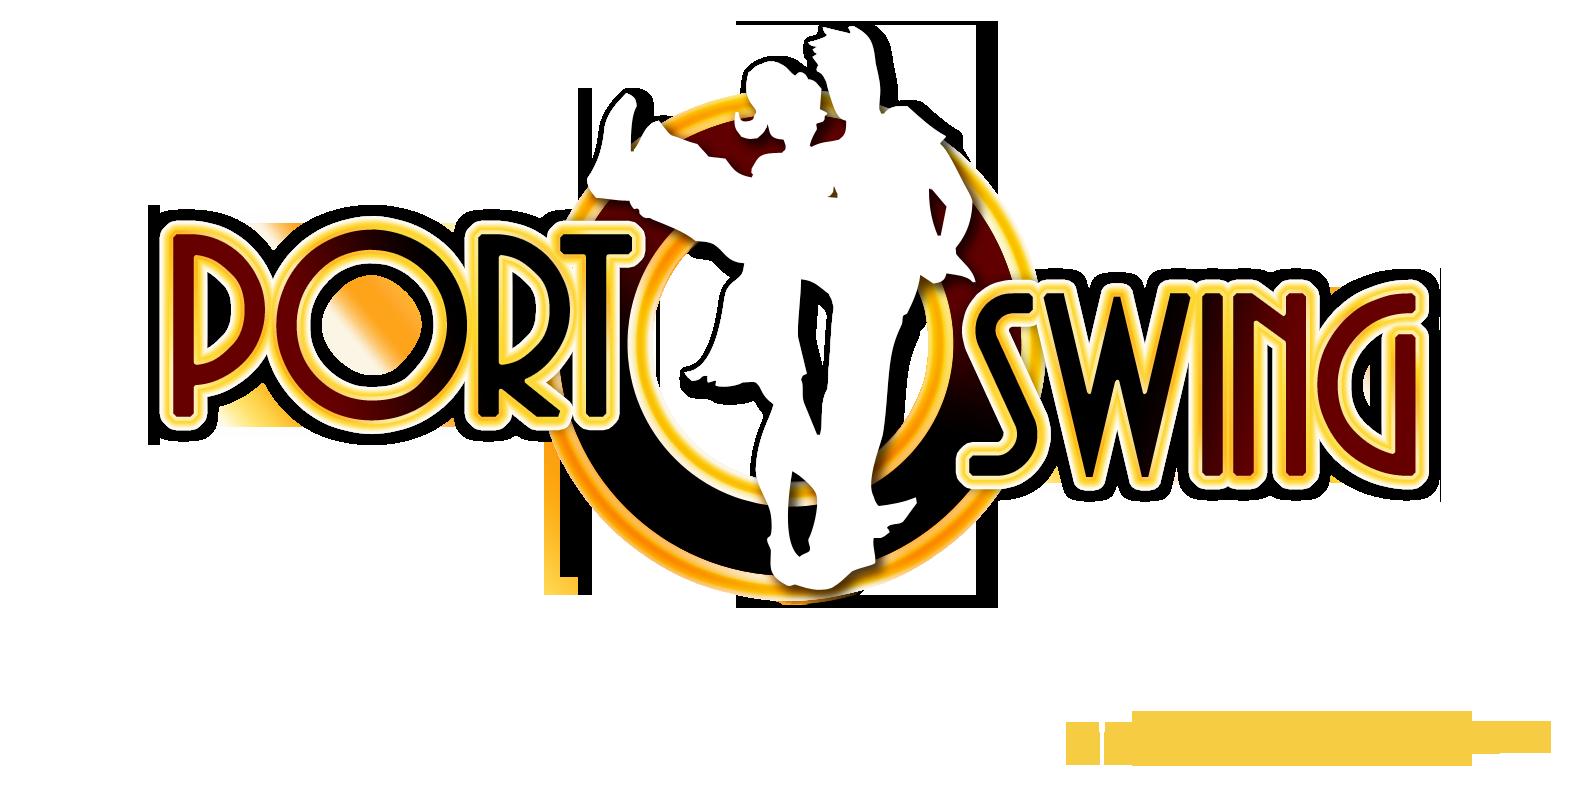 École Port-O-Swing